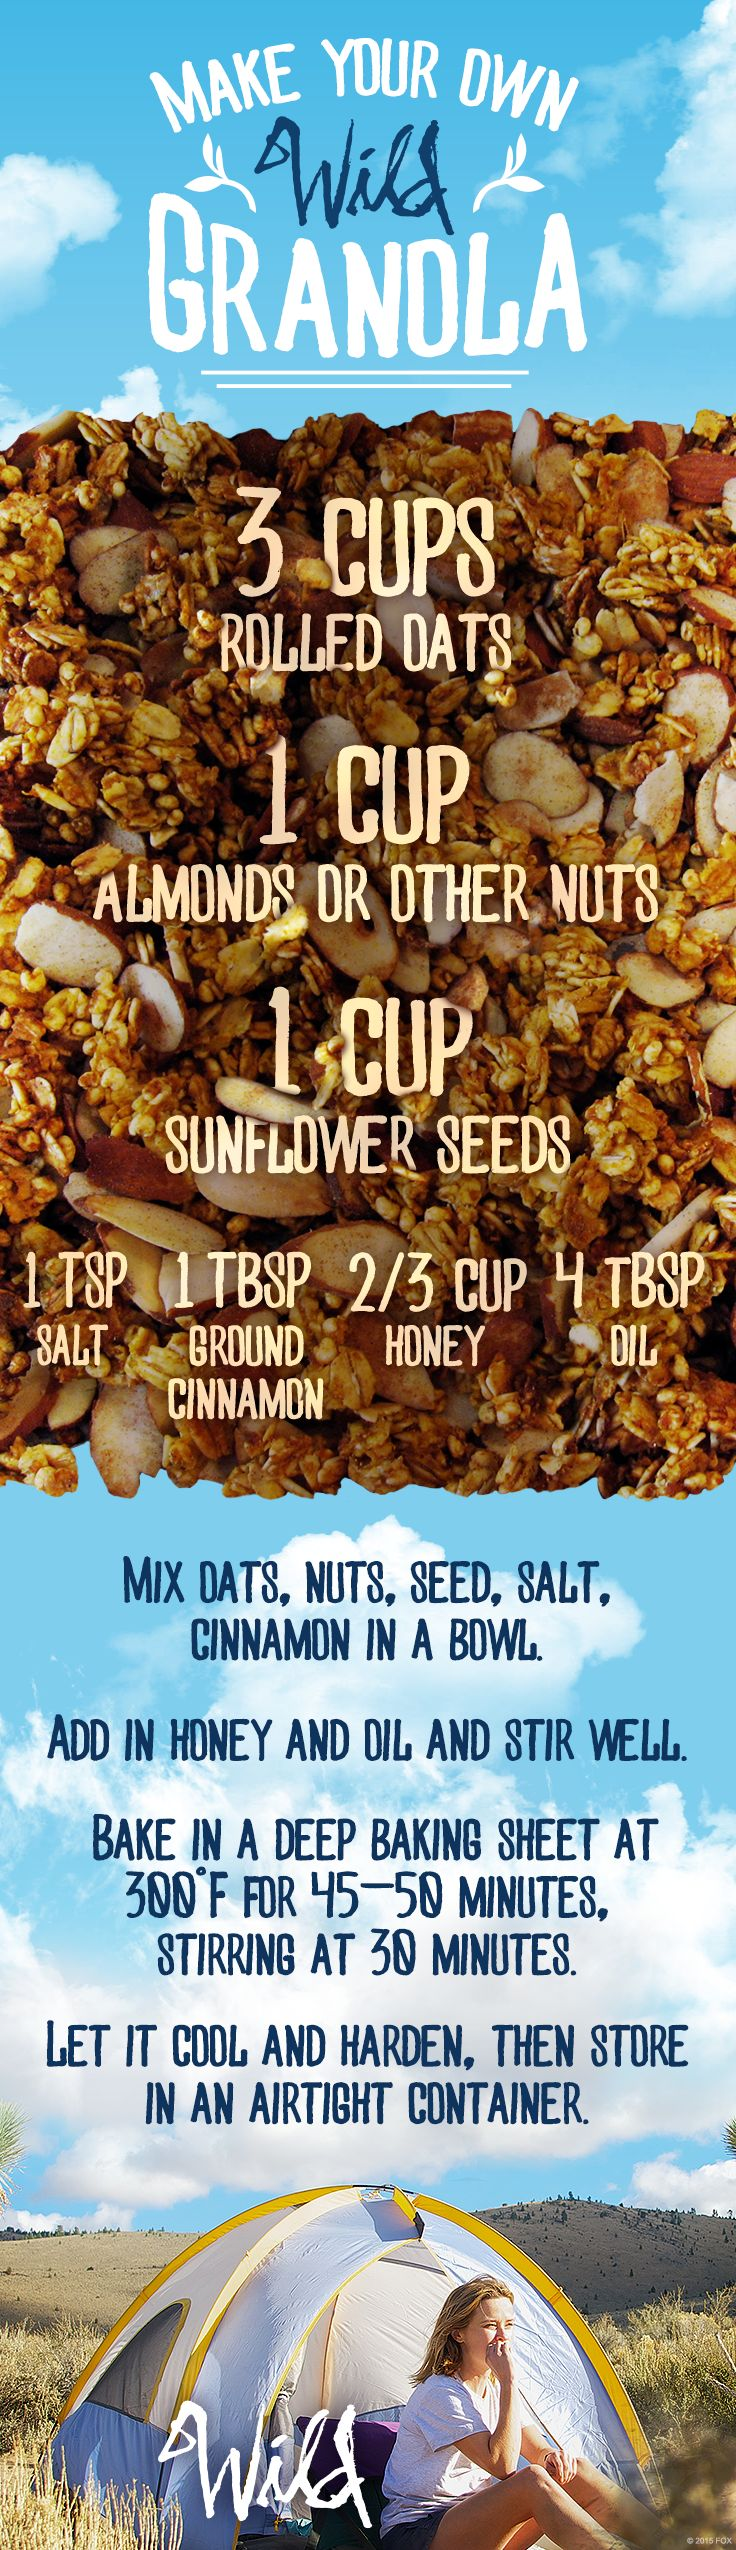 Take this homemade granola with you on your own Wild journey. #WildMovie Watch it on Digital HD! http://www.foxdigitalhd.com/wild